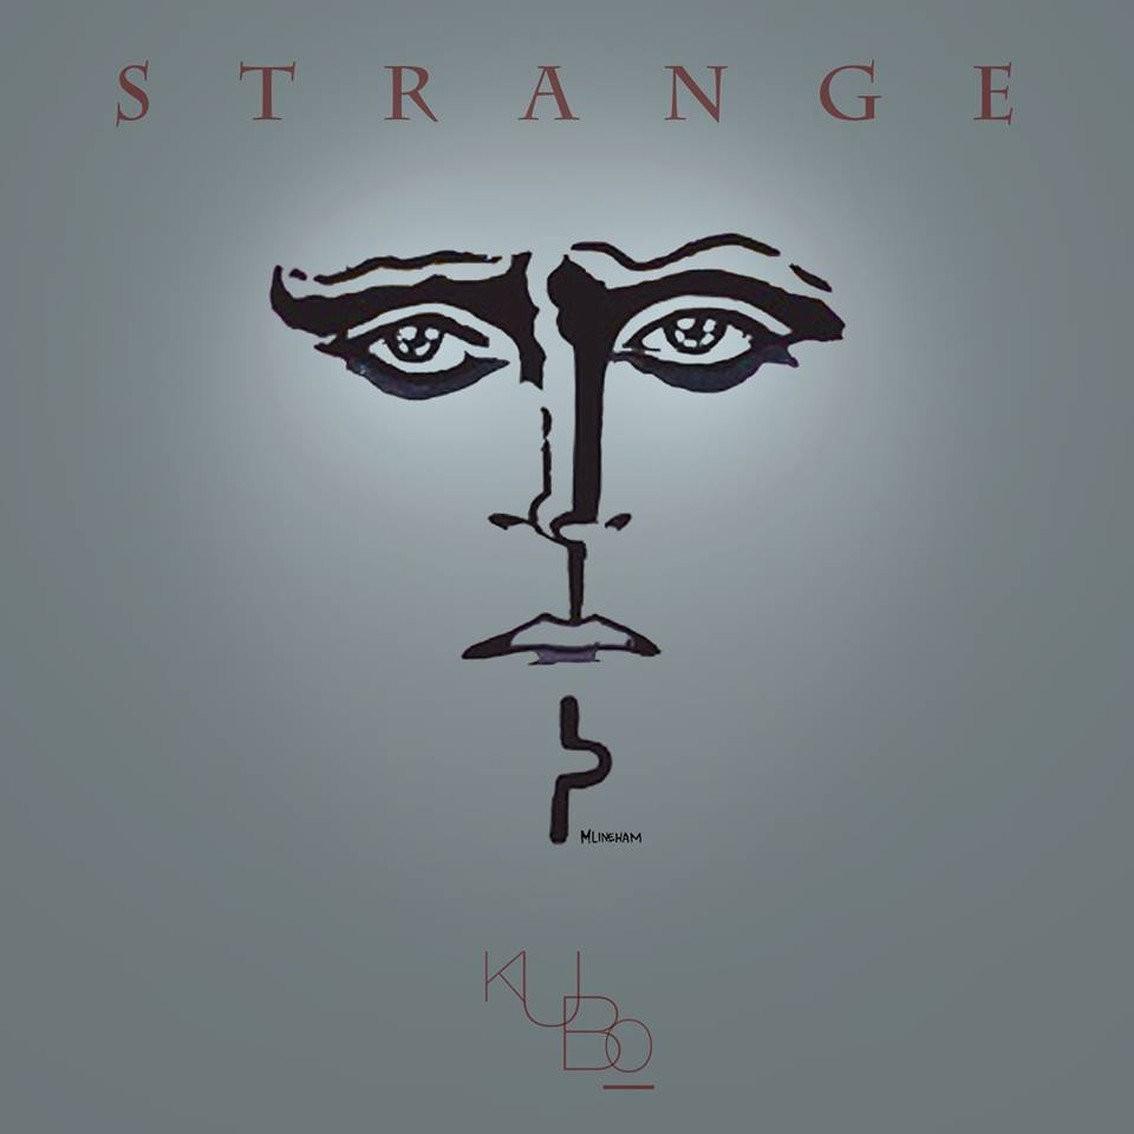 KuBO launch office video for 'Strange' single in tribute to Steve Strange